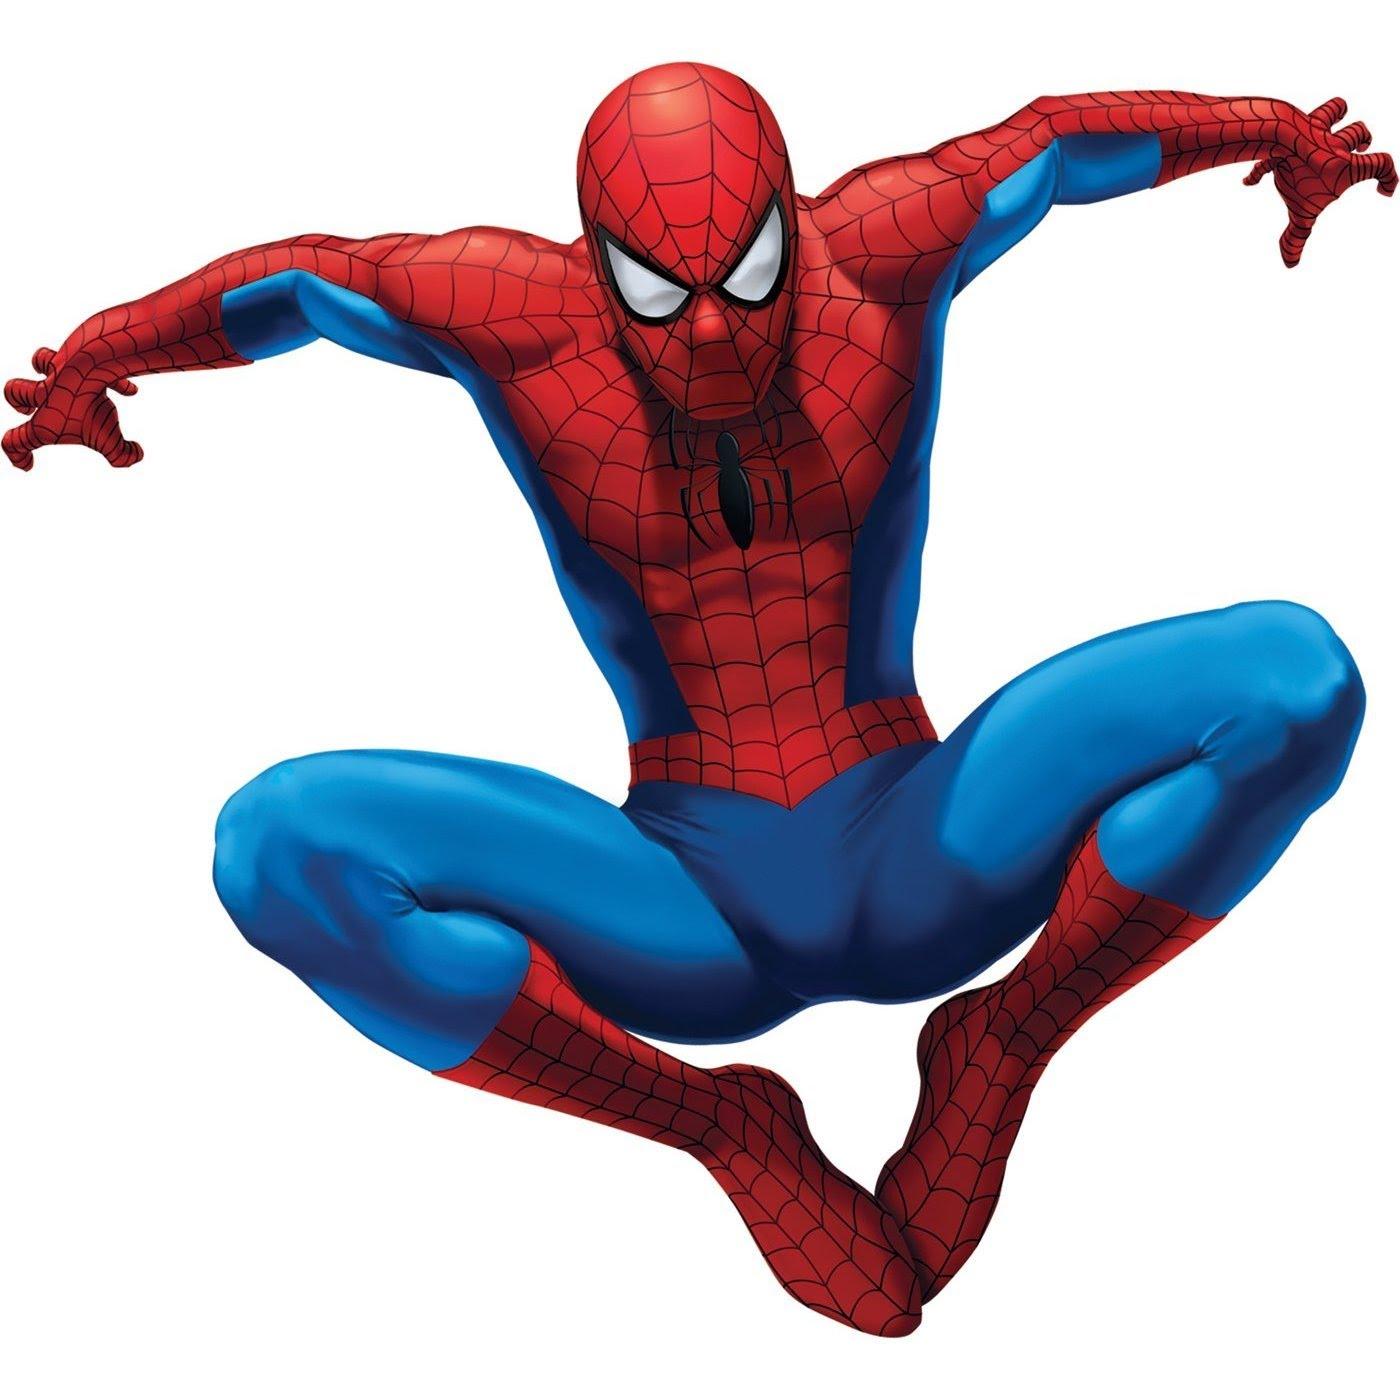 Spiderman clipart cartoon character Games ClipArt spiderman Cartoon Best